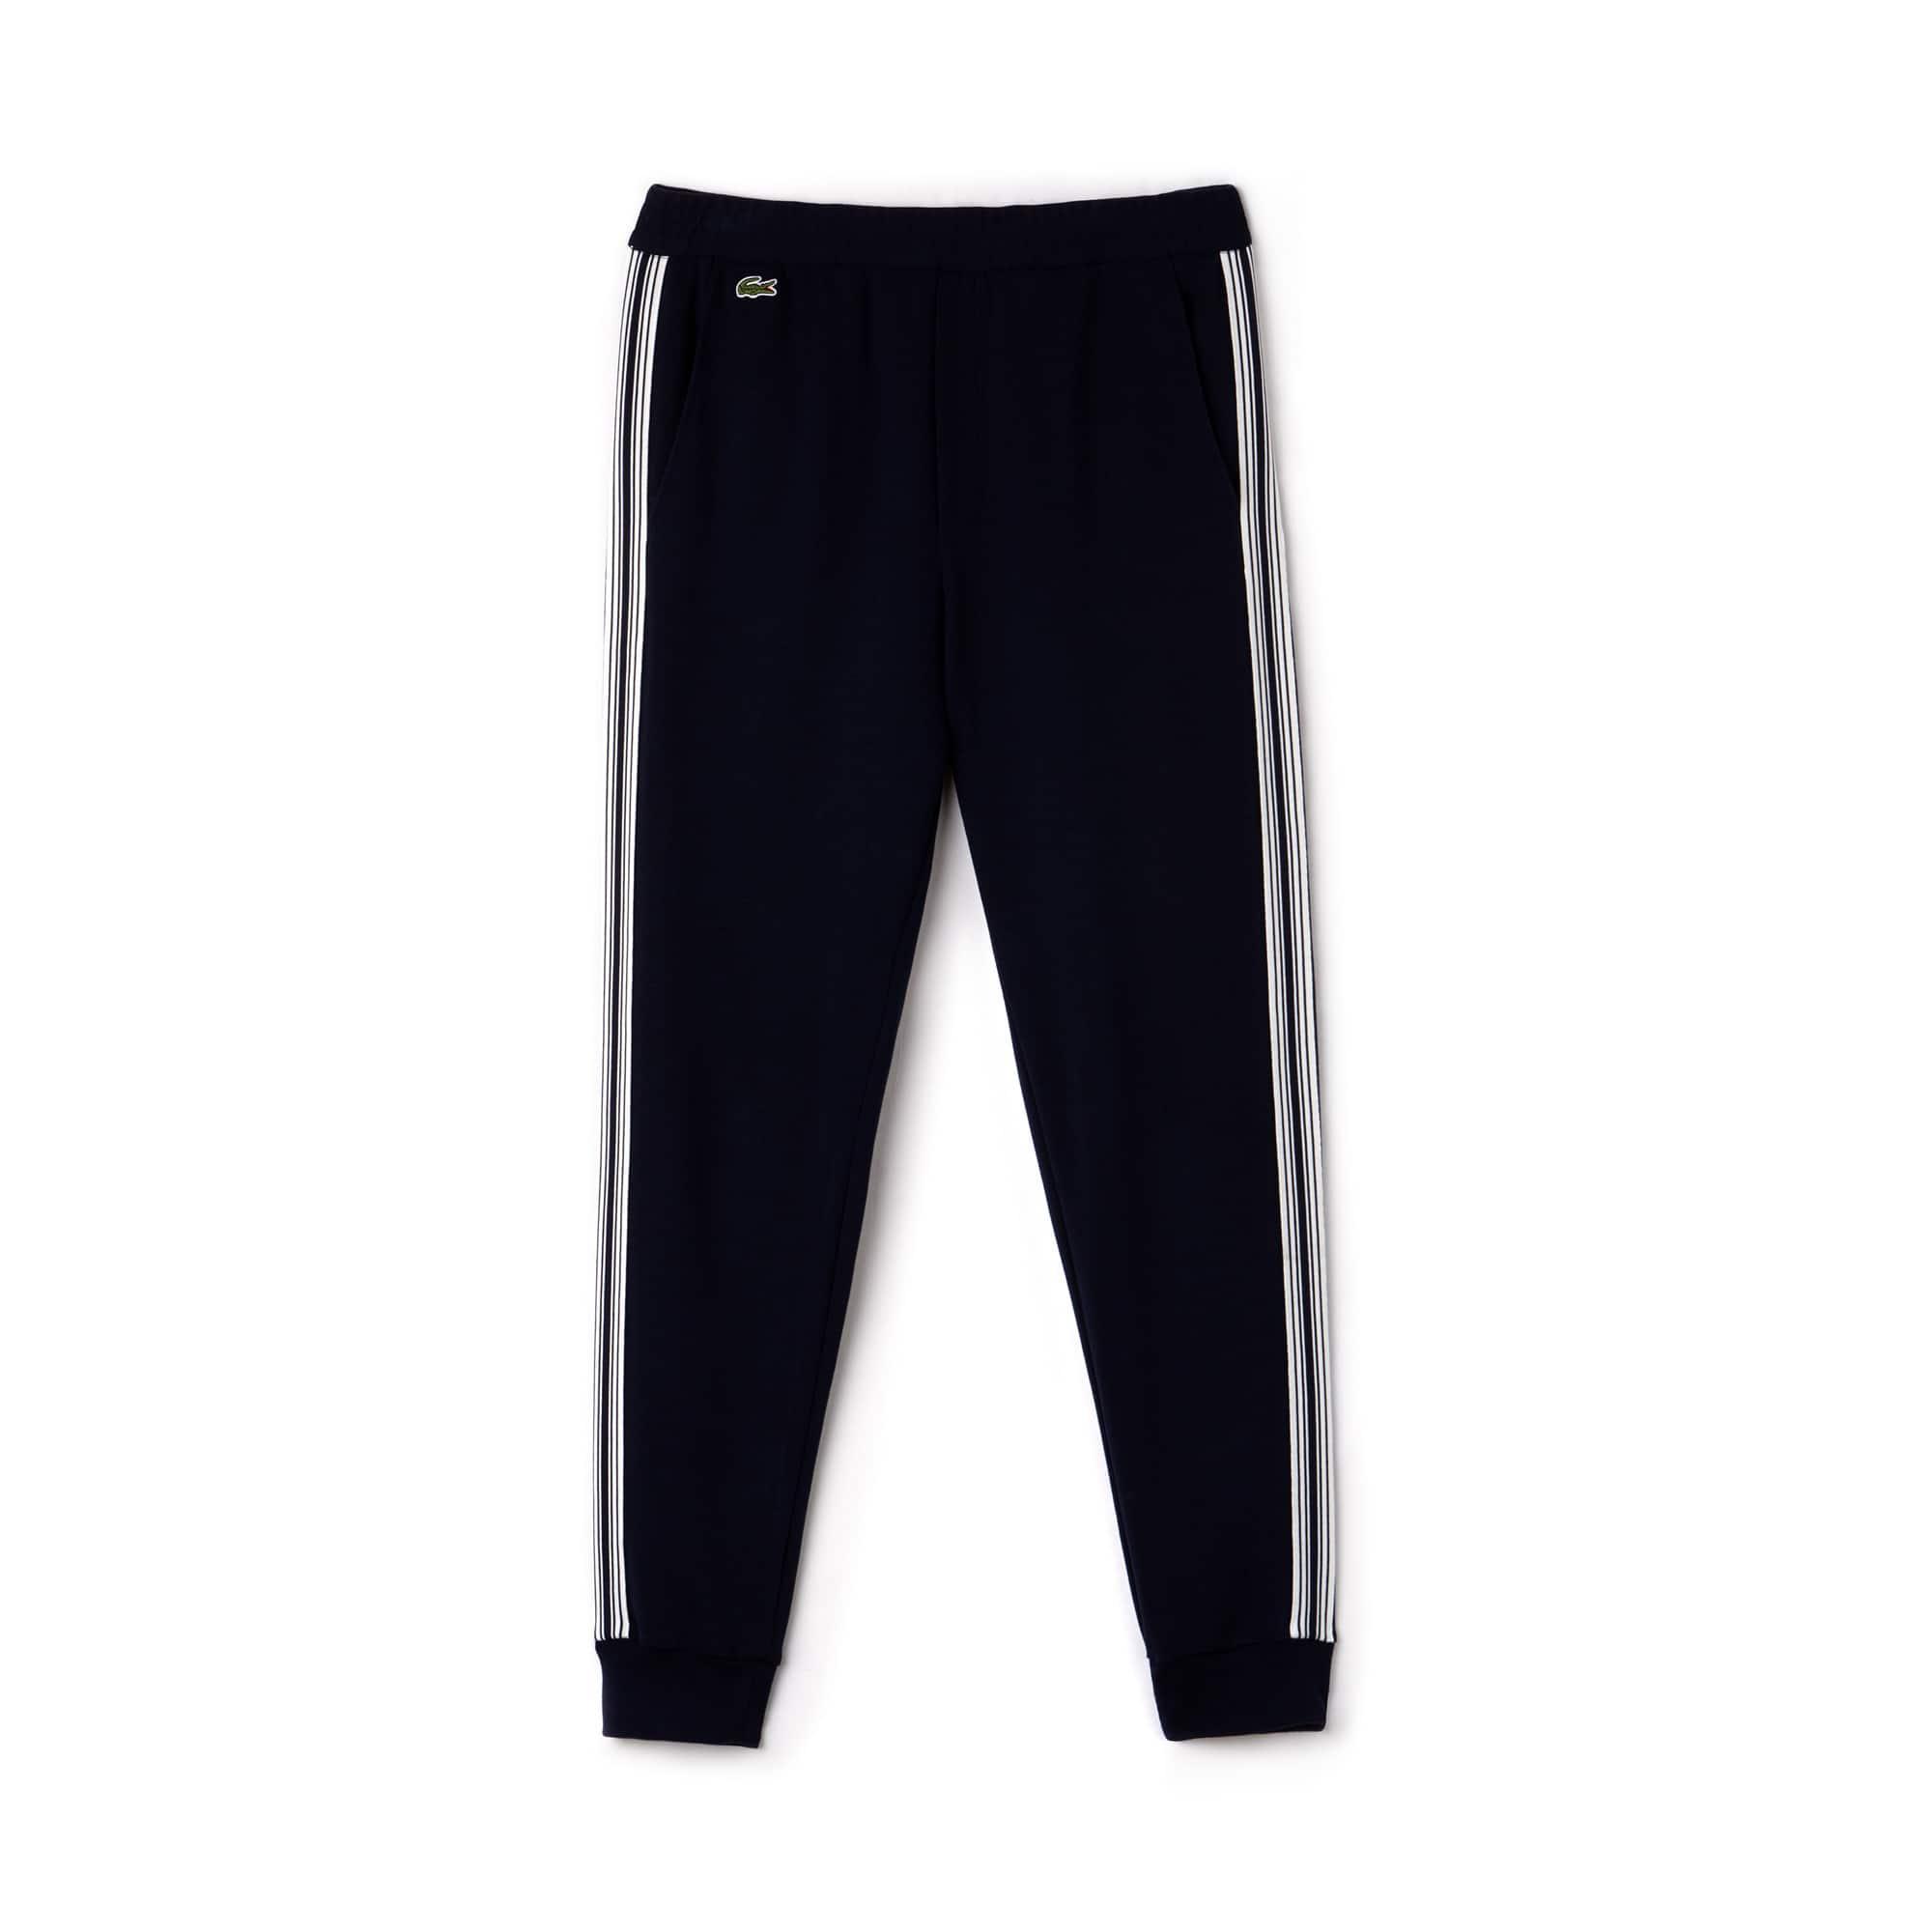 Men's Milano Urban Jogging Pants